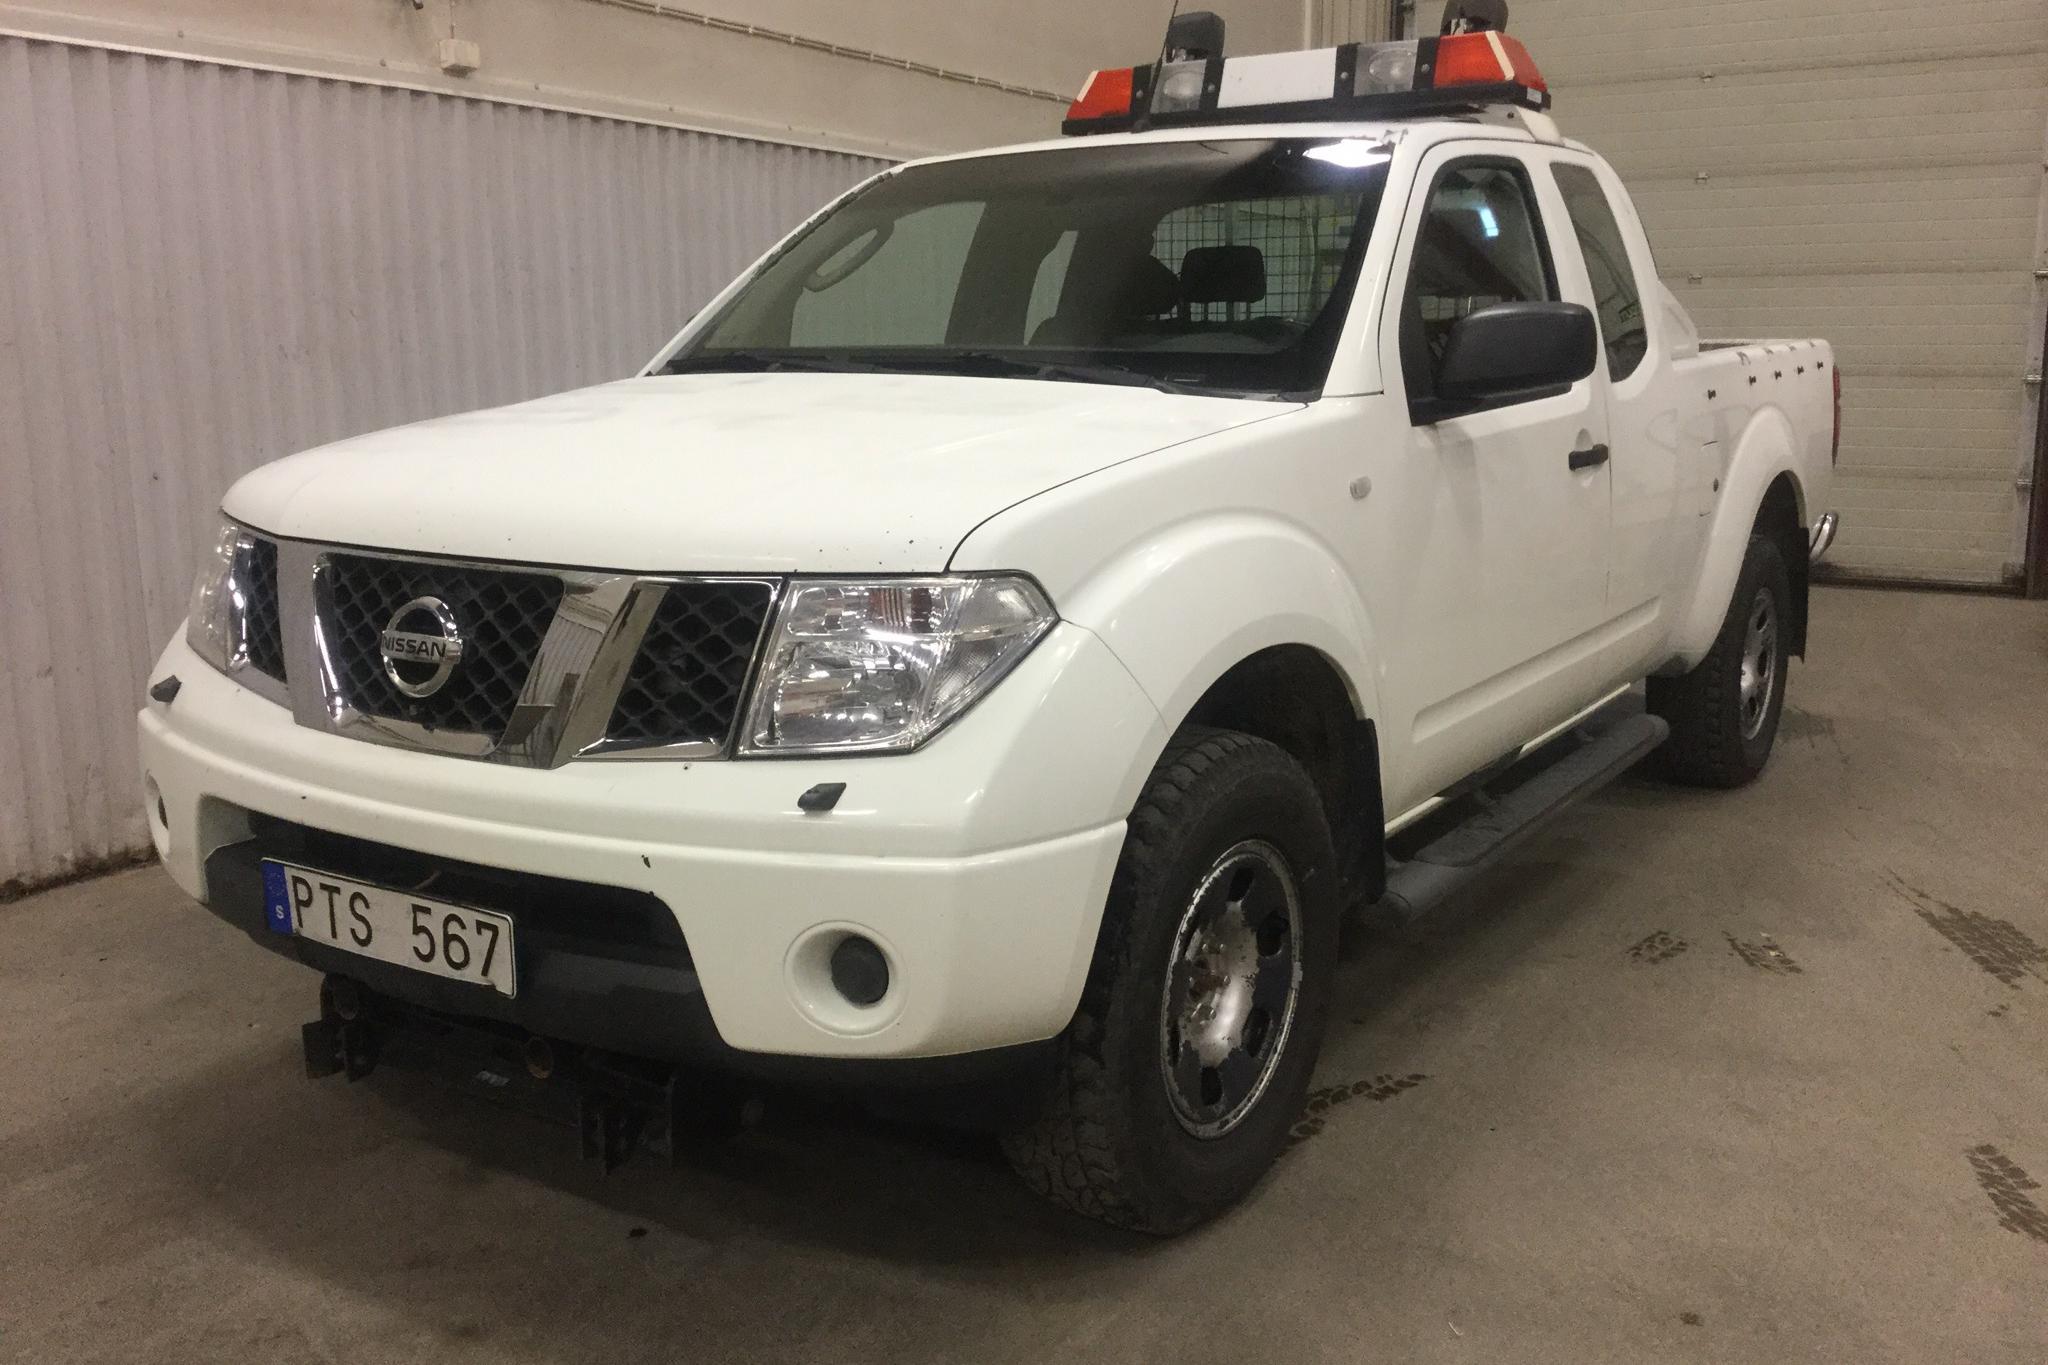 Nissan Navara 2.5 dCi 4WD (171hk) - 0 mil - Manuell - vit - 2007